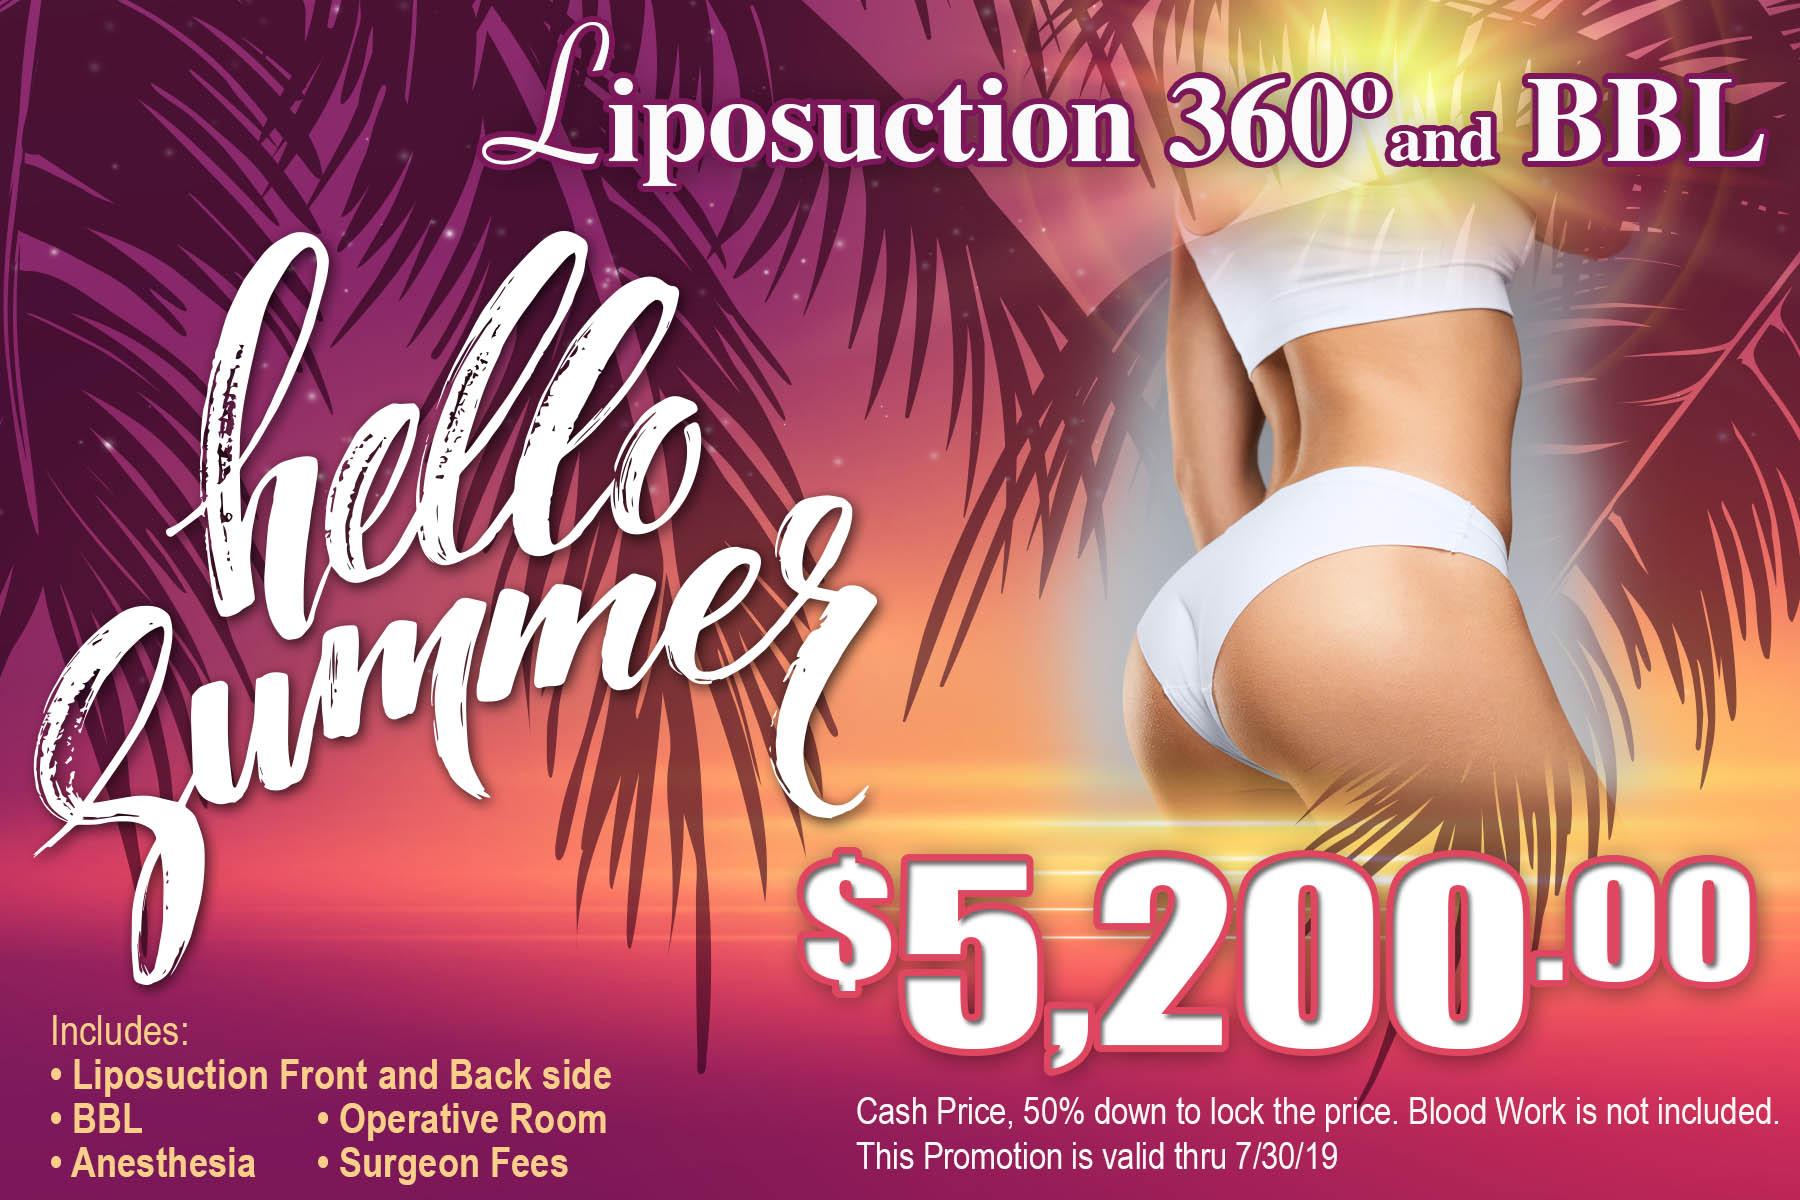 Lipo 360 Specials